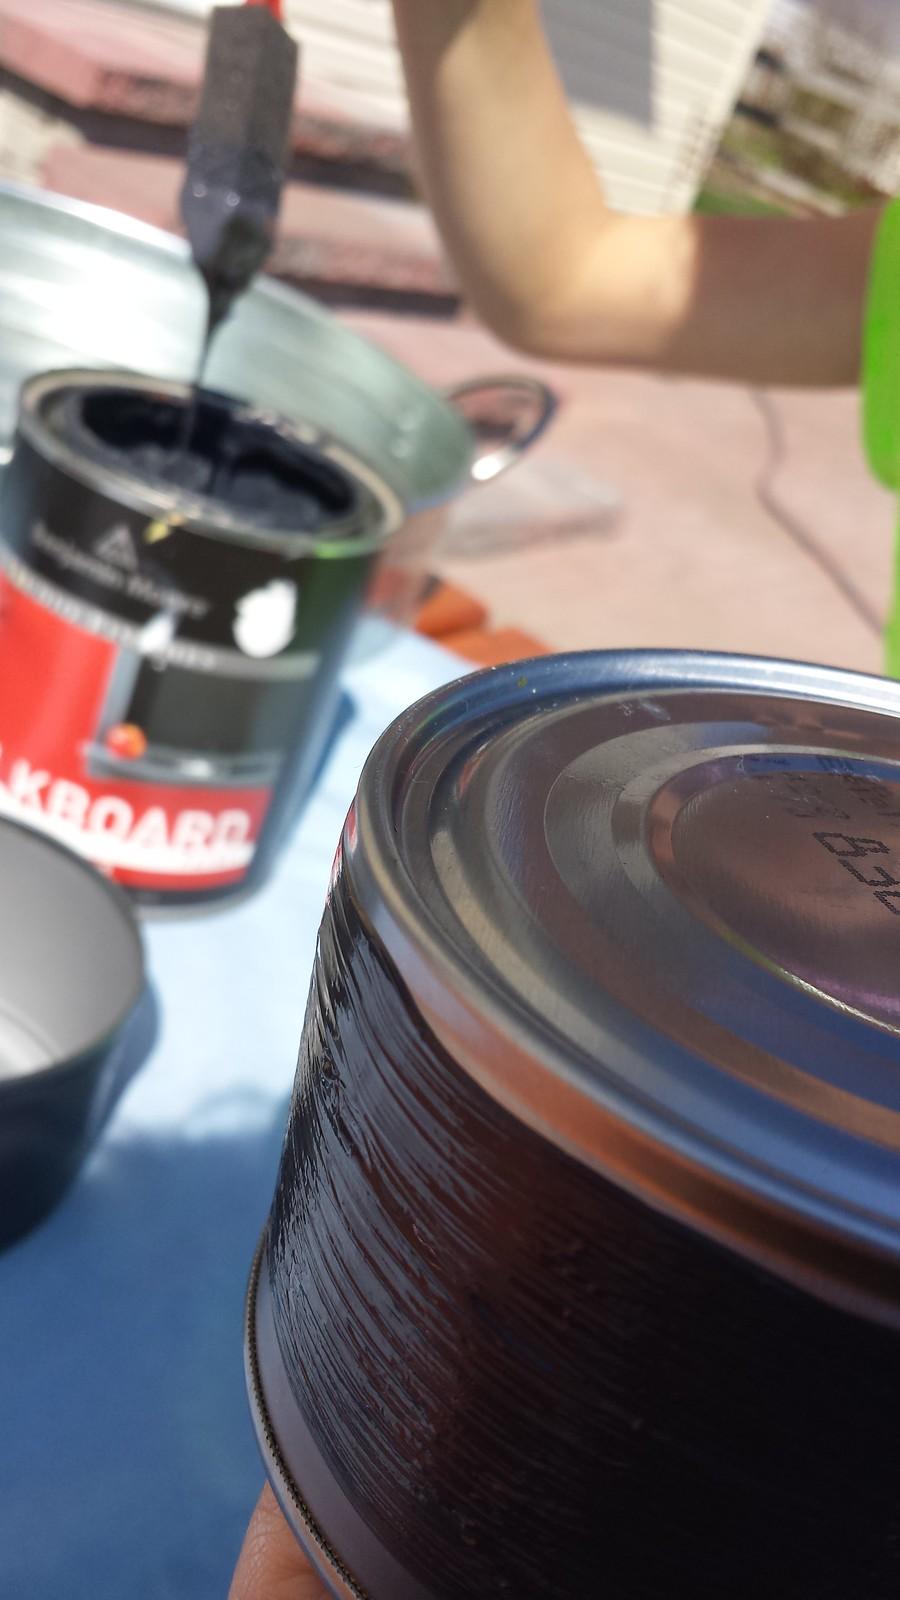 Chalkboard cans